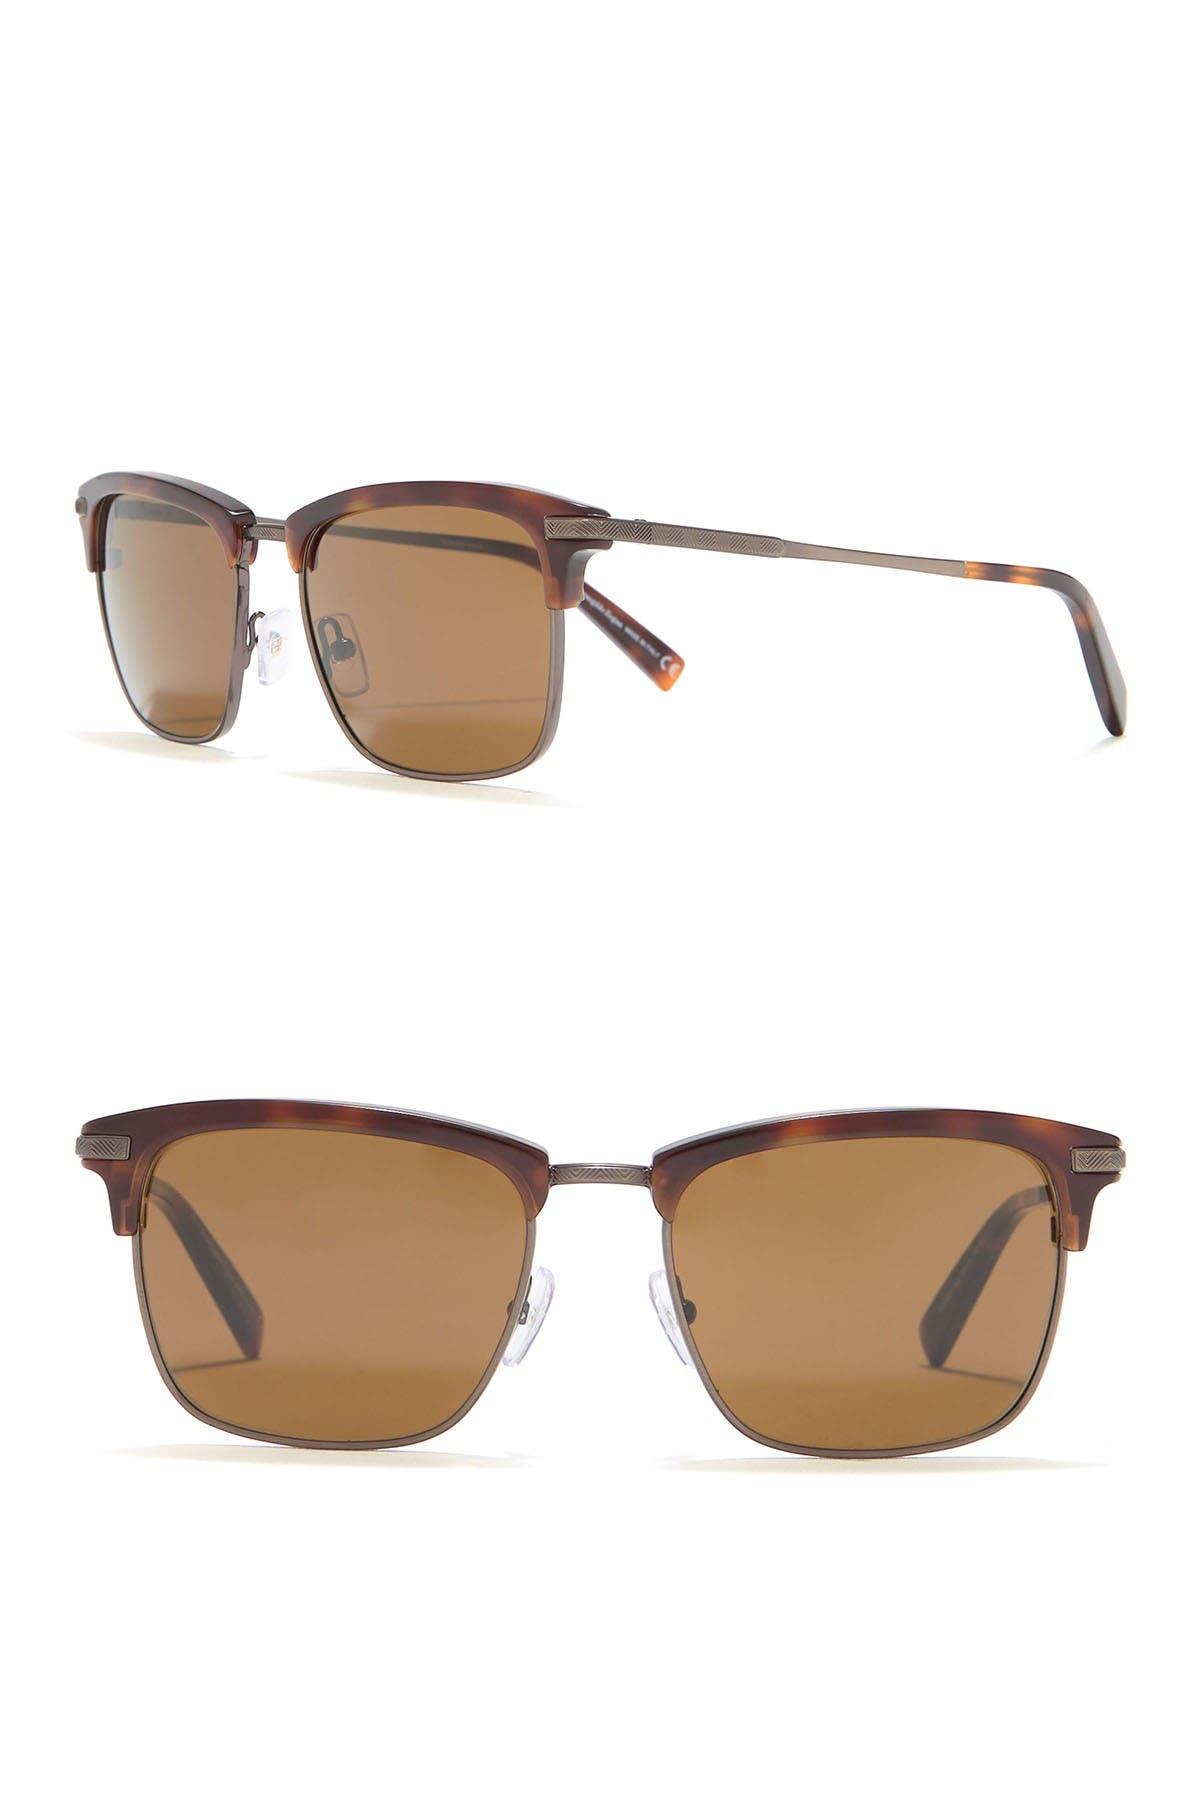 Image of Ermenegildo Zegna Clubmaster 53mm Sunglasses